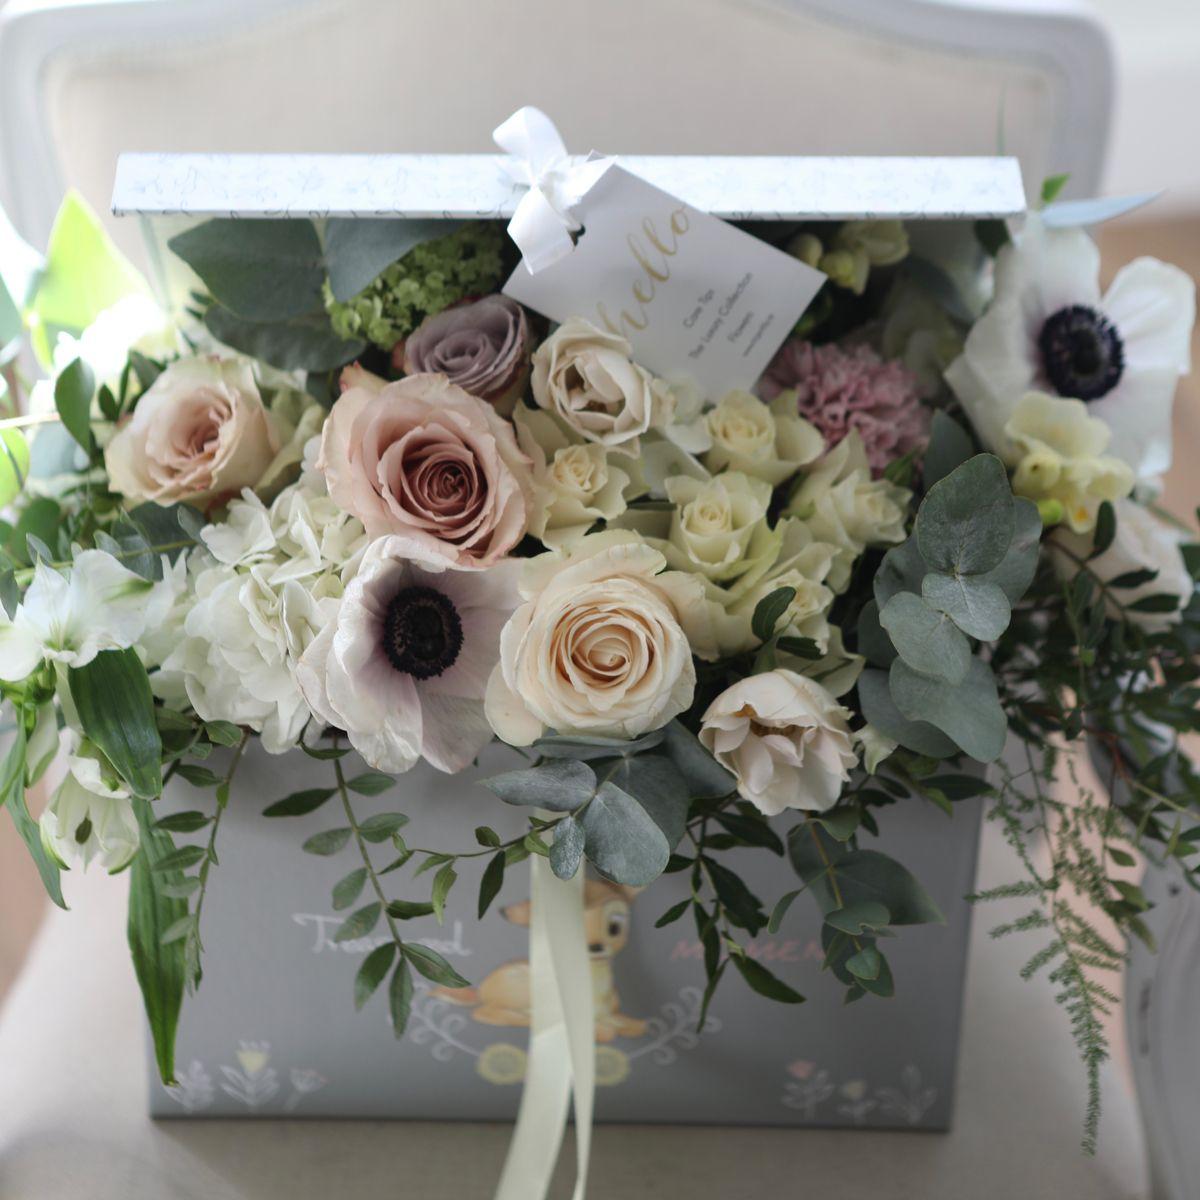 Flowers arranges in keepsake Baby Box in 2020 Hat box